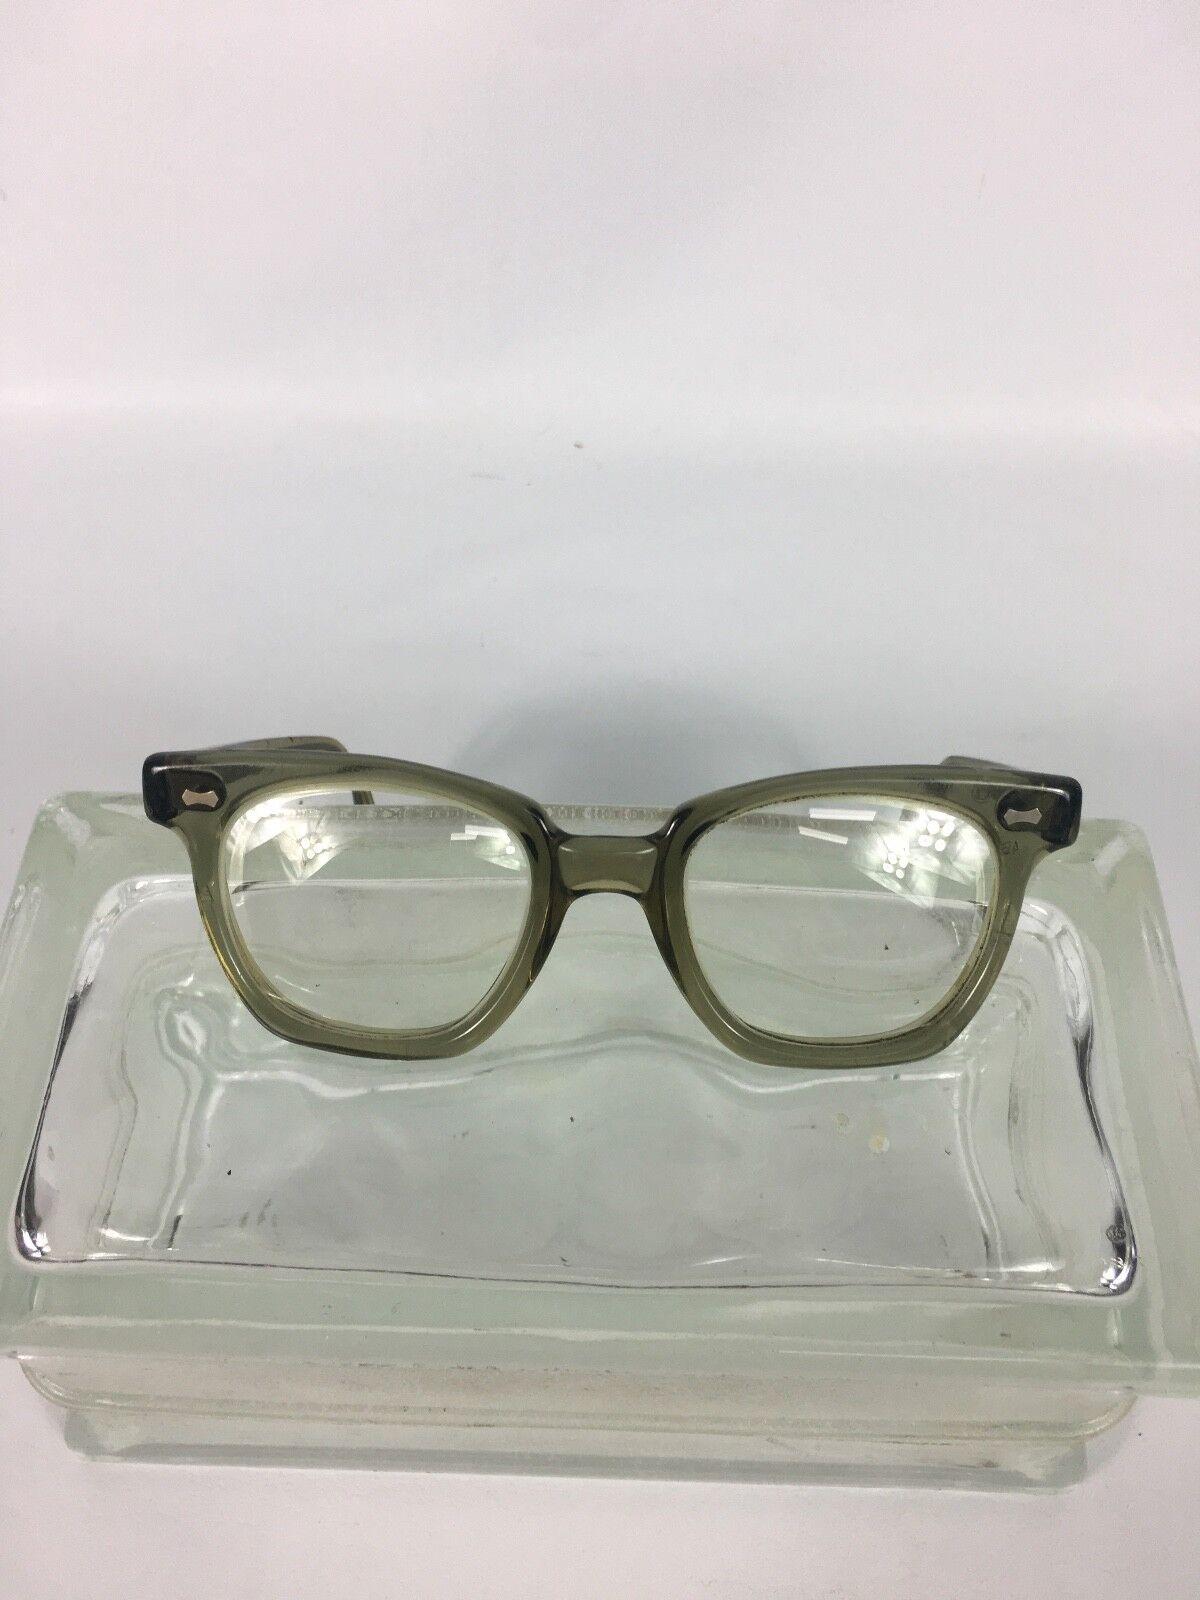 * US Safety * Vintage Glasses Retro Clear Gray 4 3/4 Mod Steampunk Prescription!